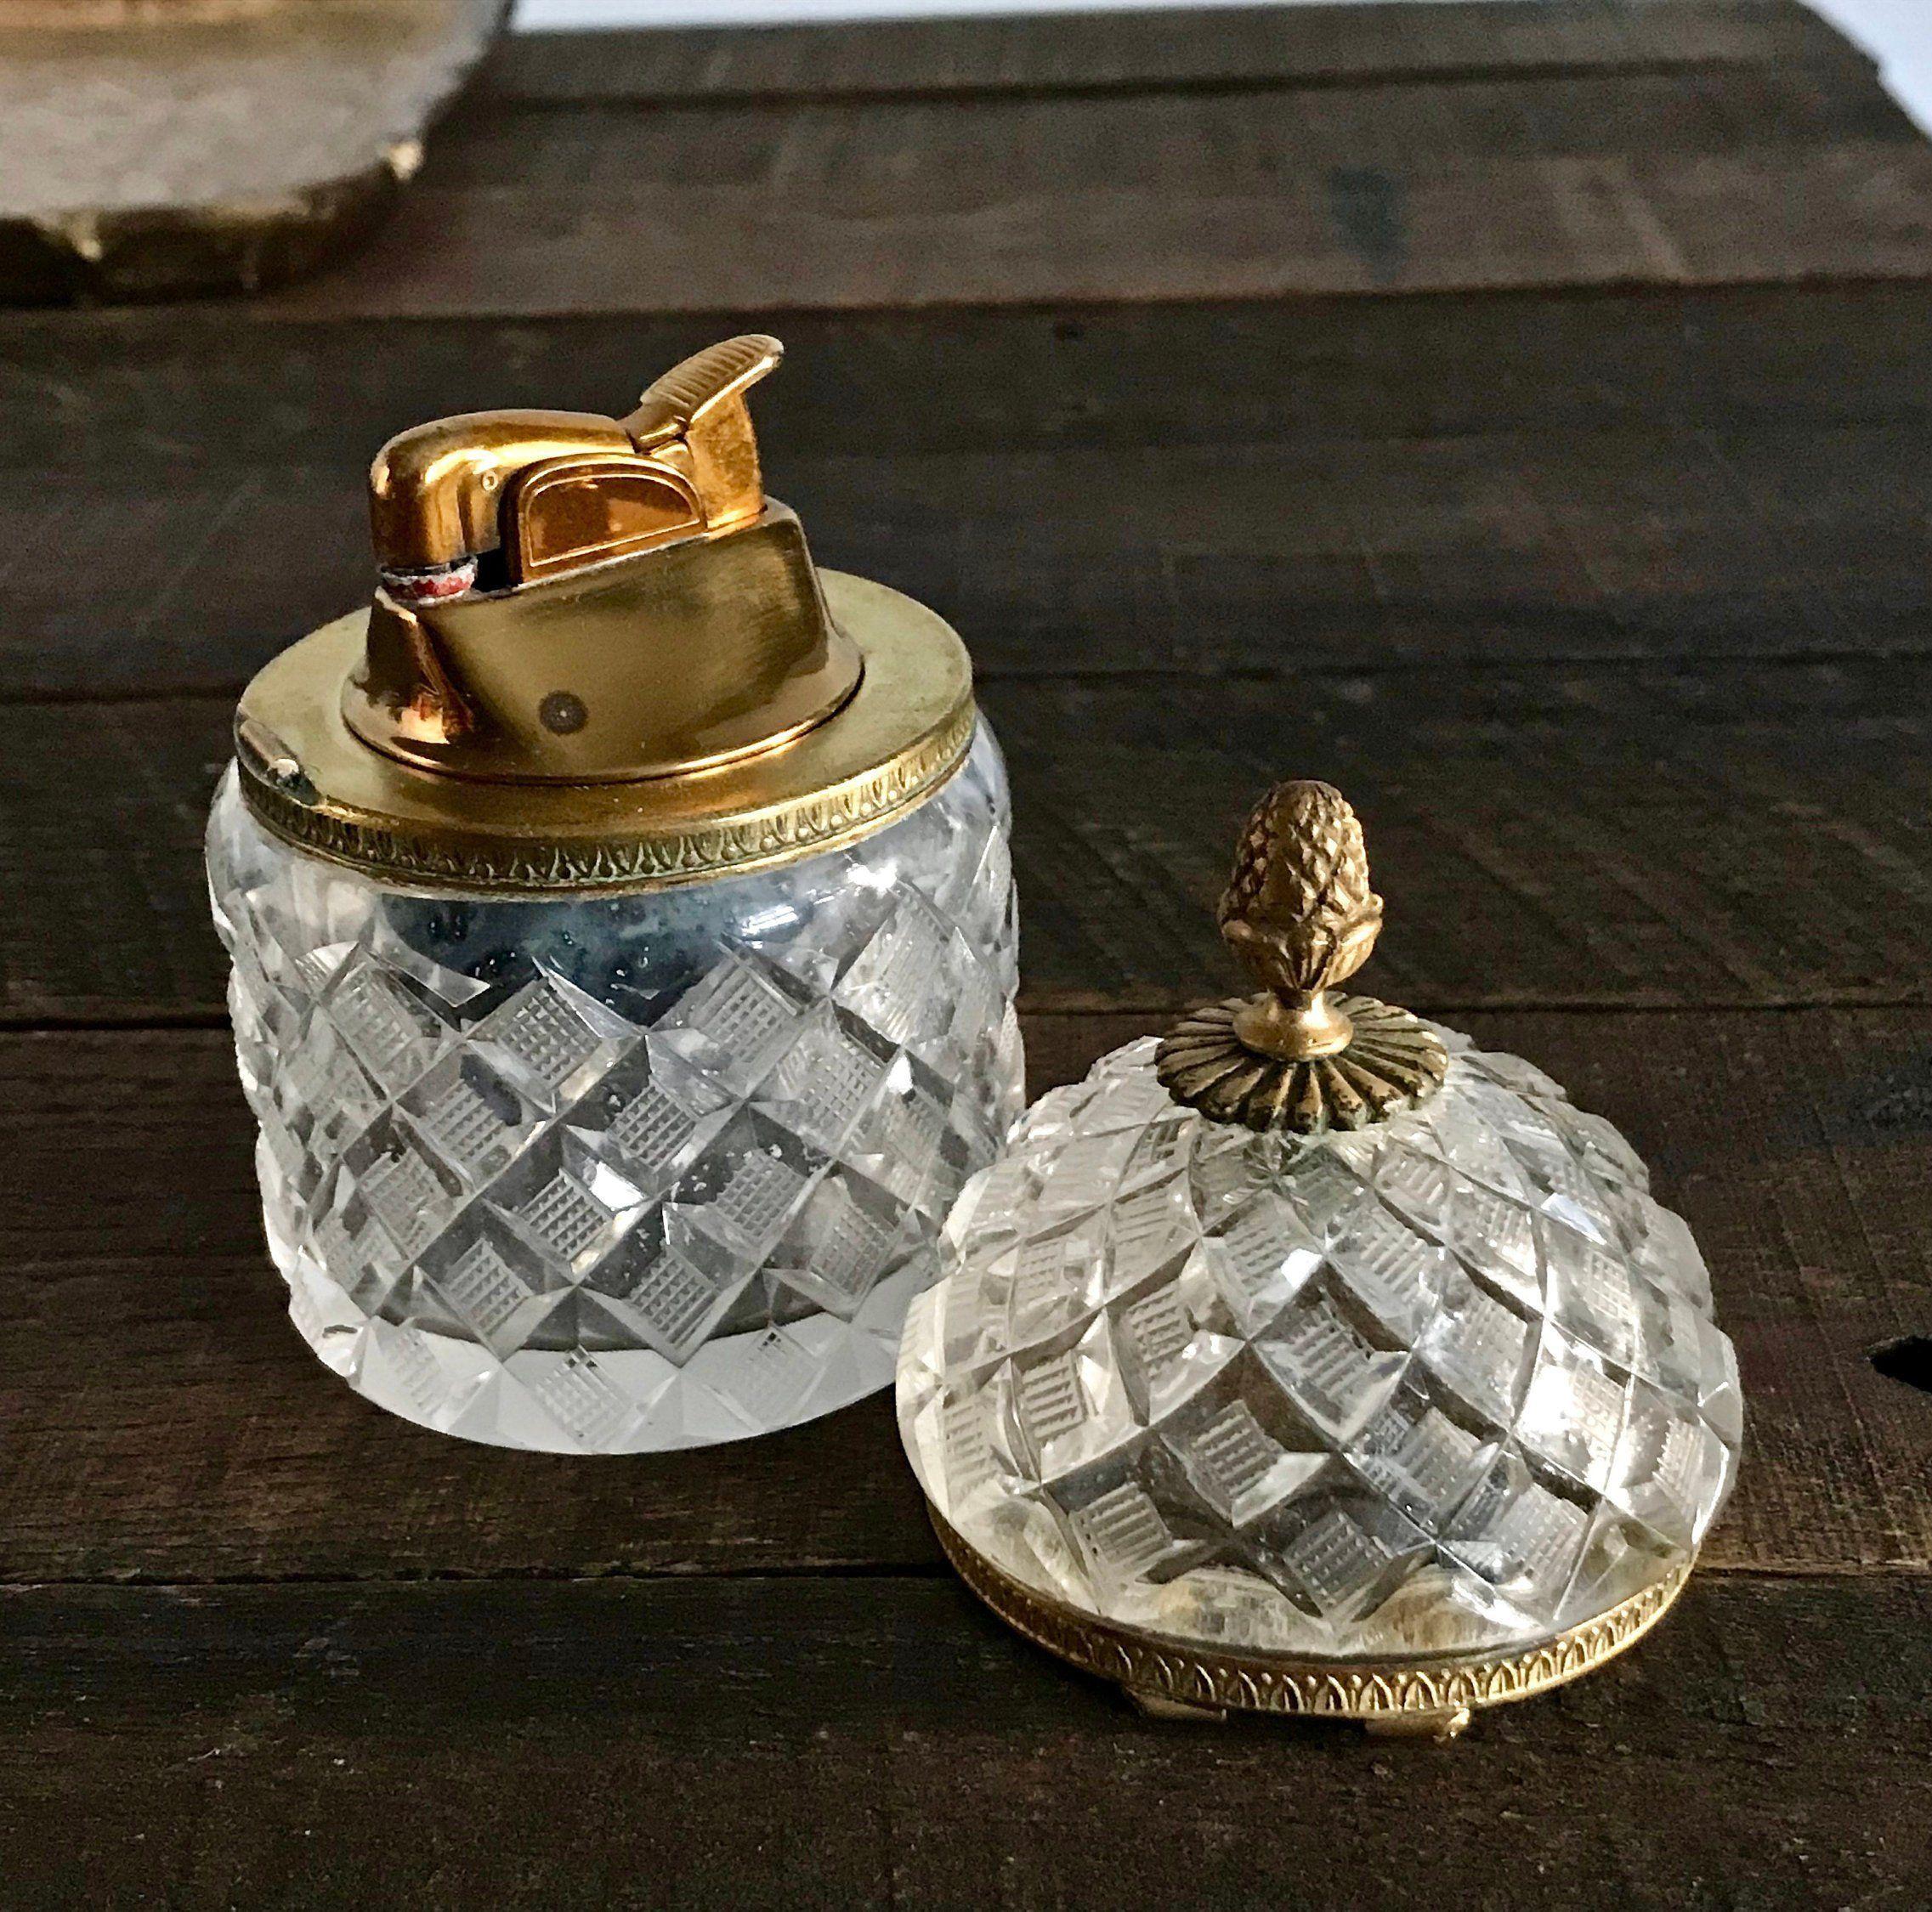 Vintage French Crystal Table Lighter Antique Evans Lighter Light Table French Vintage Crystal Vase